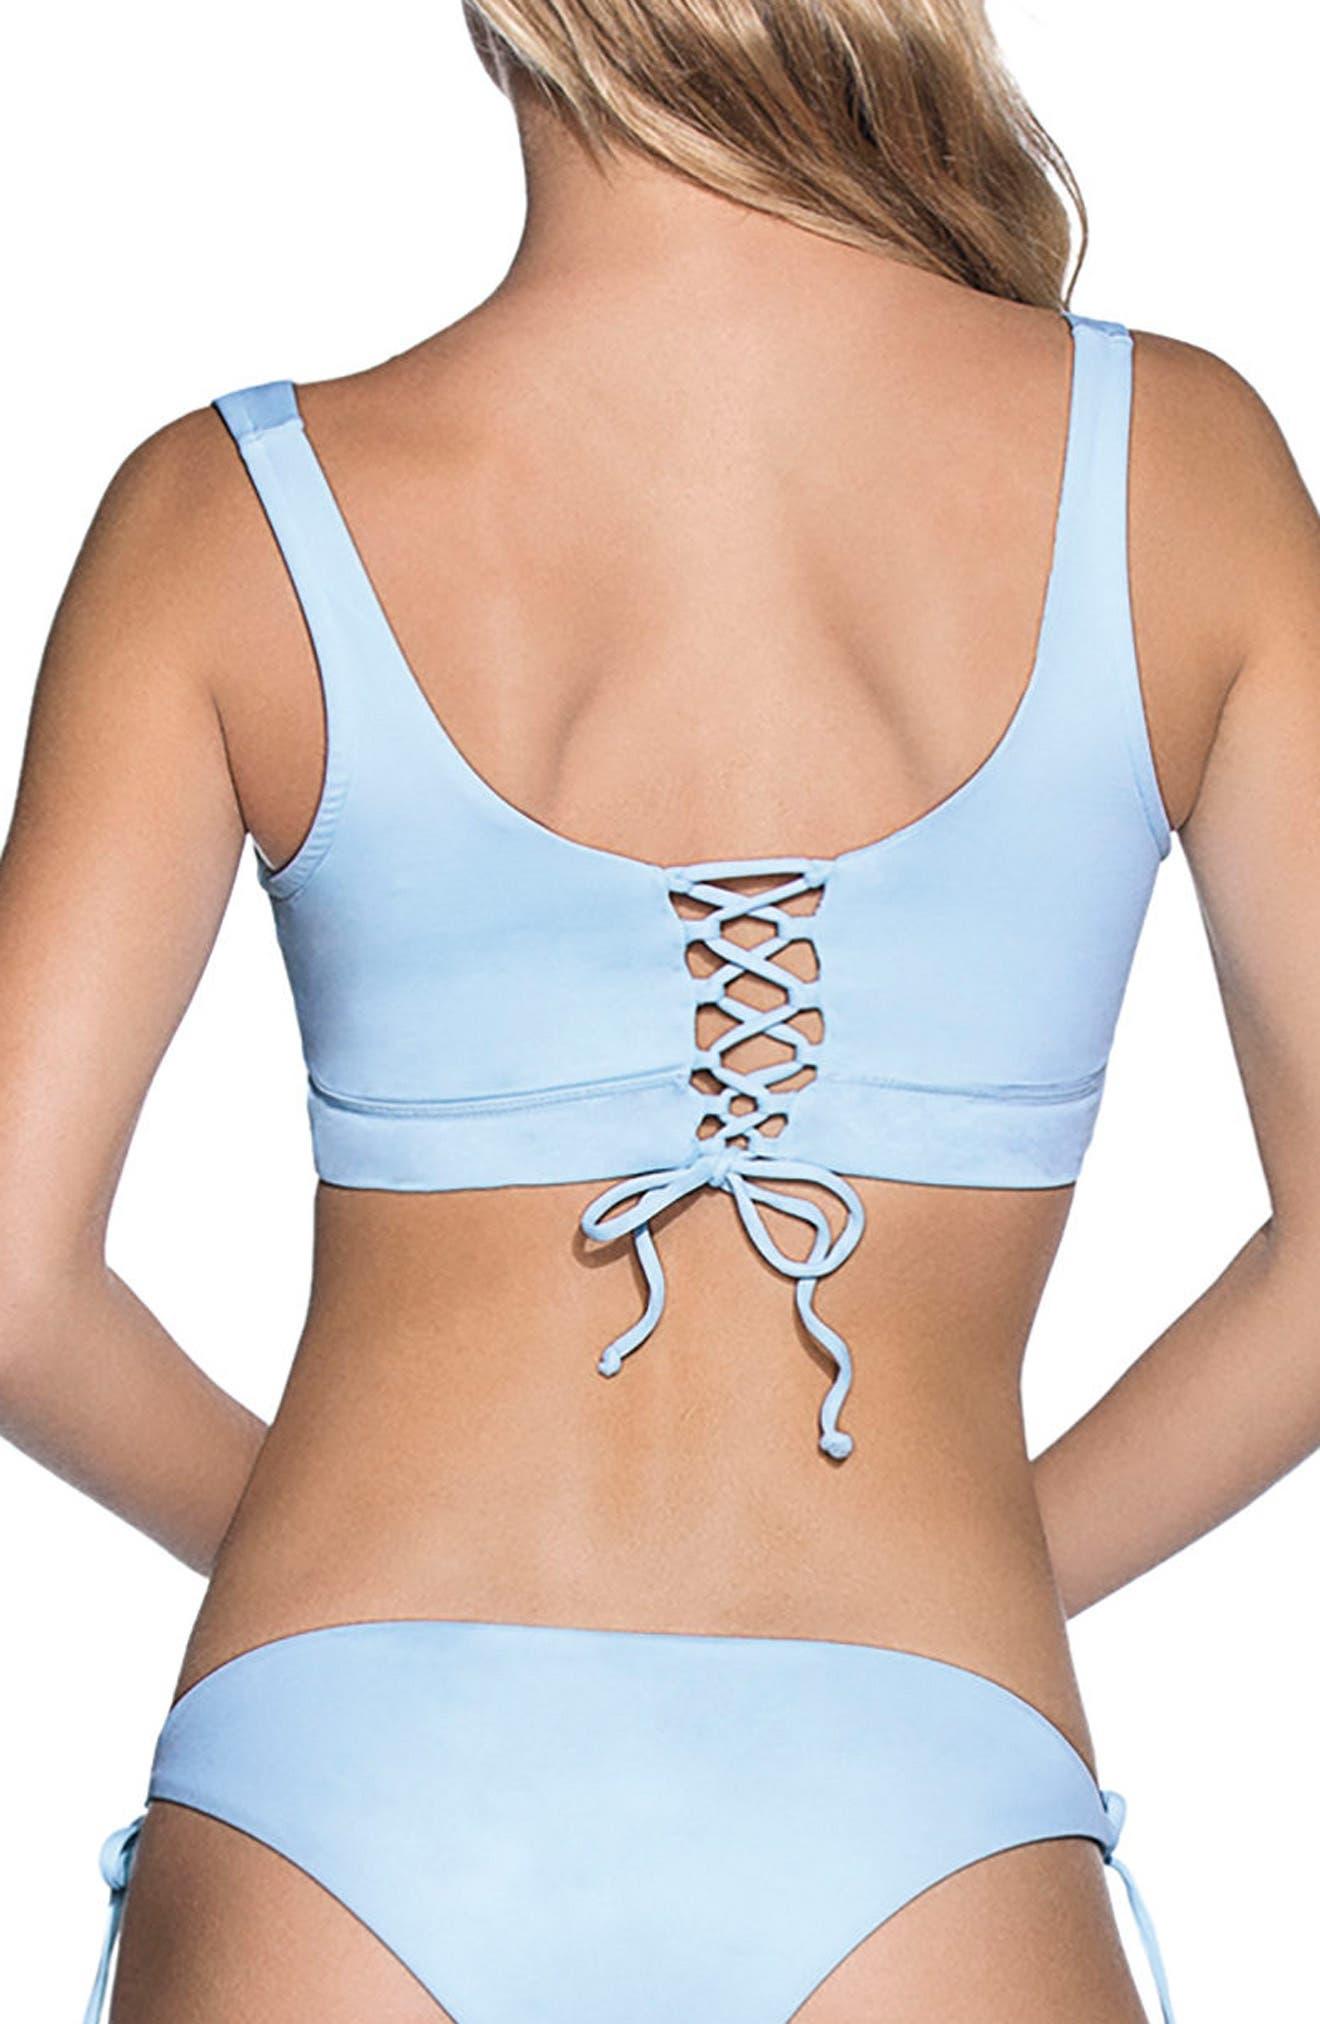 Crystal Blue Allure Reversible Bikini Top,                             Alternate thumbnail 3, color,                             450